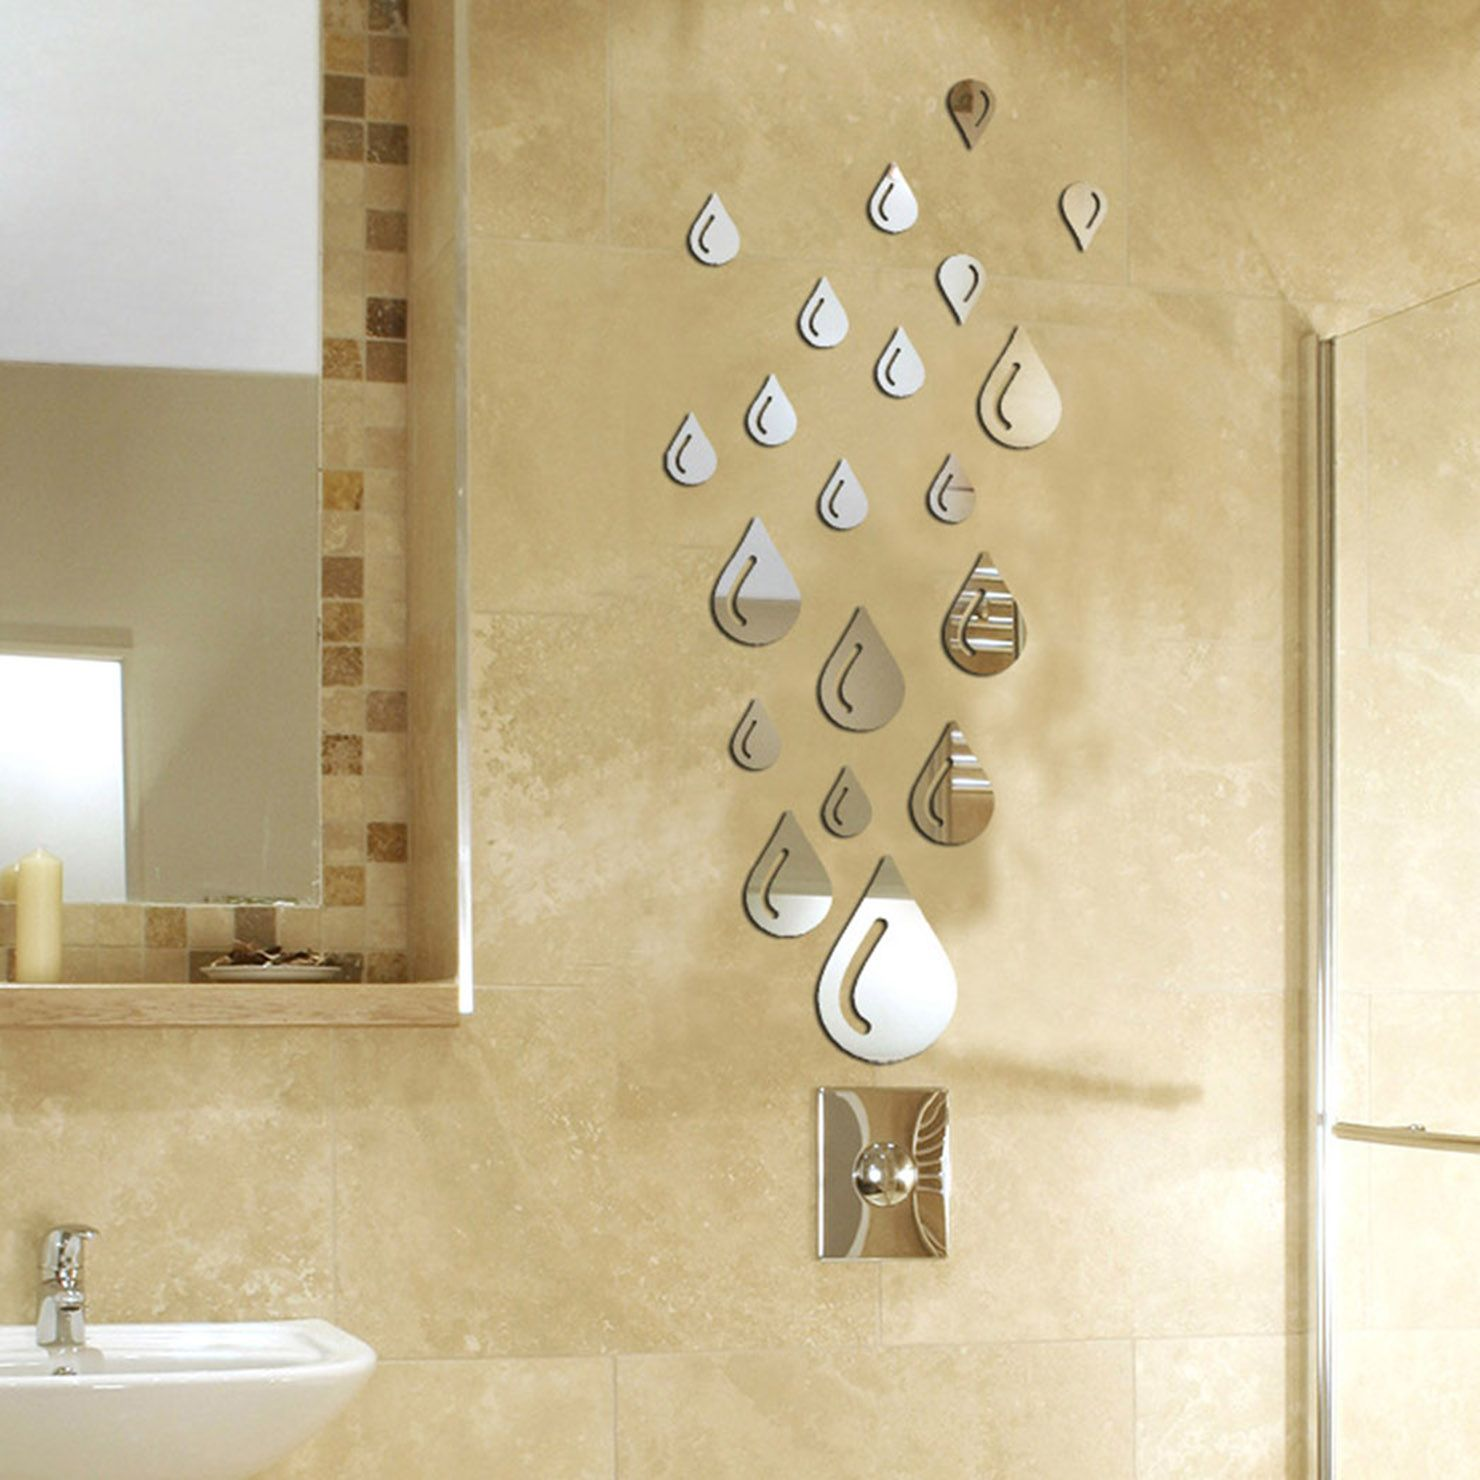 Raindrops Mirrored Wall Sticker | Wall sticker and Walls